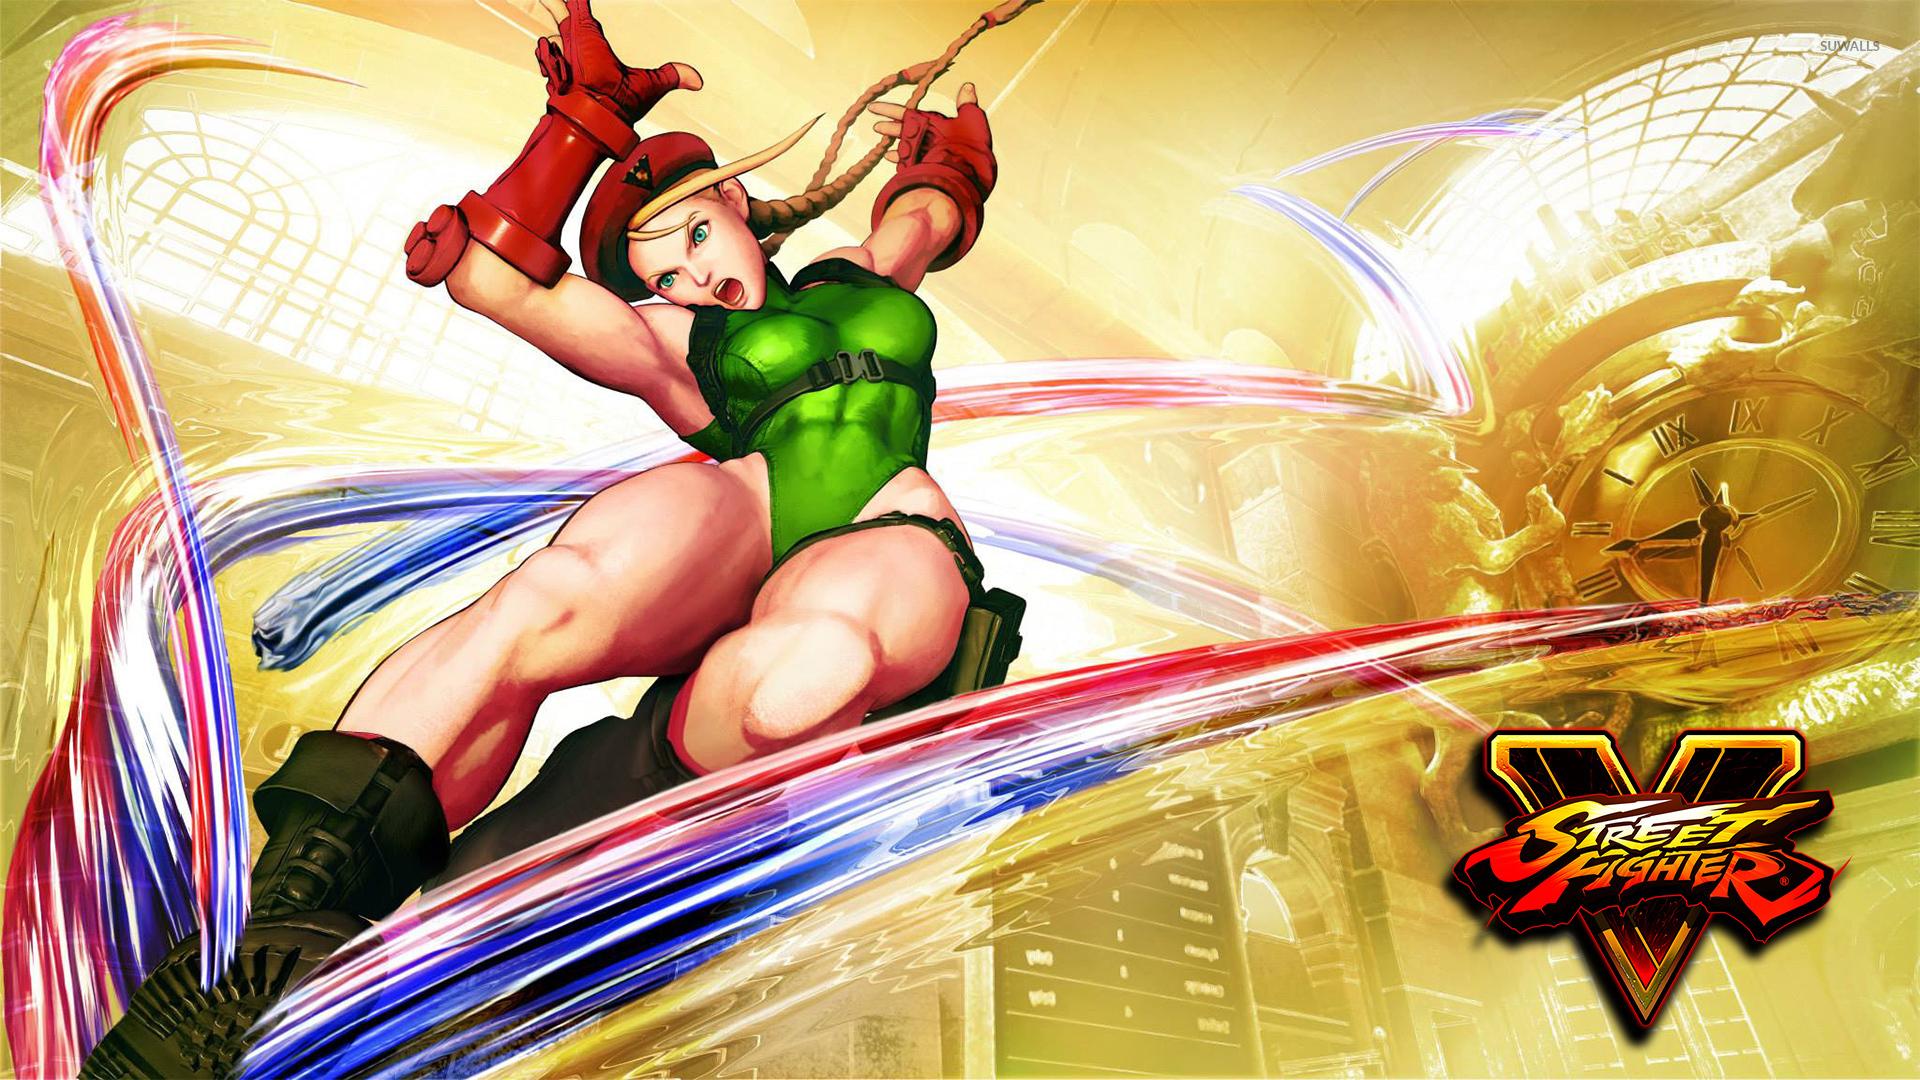 Street Fighter 4 Wallpapers: WallpaperSafari